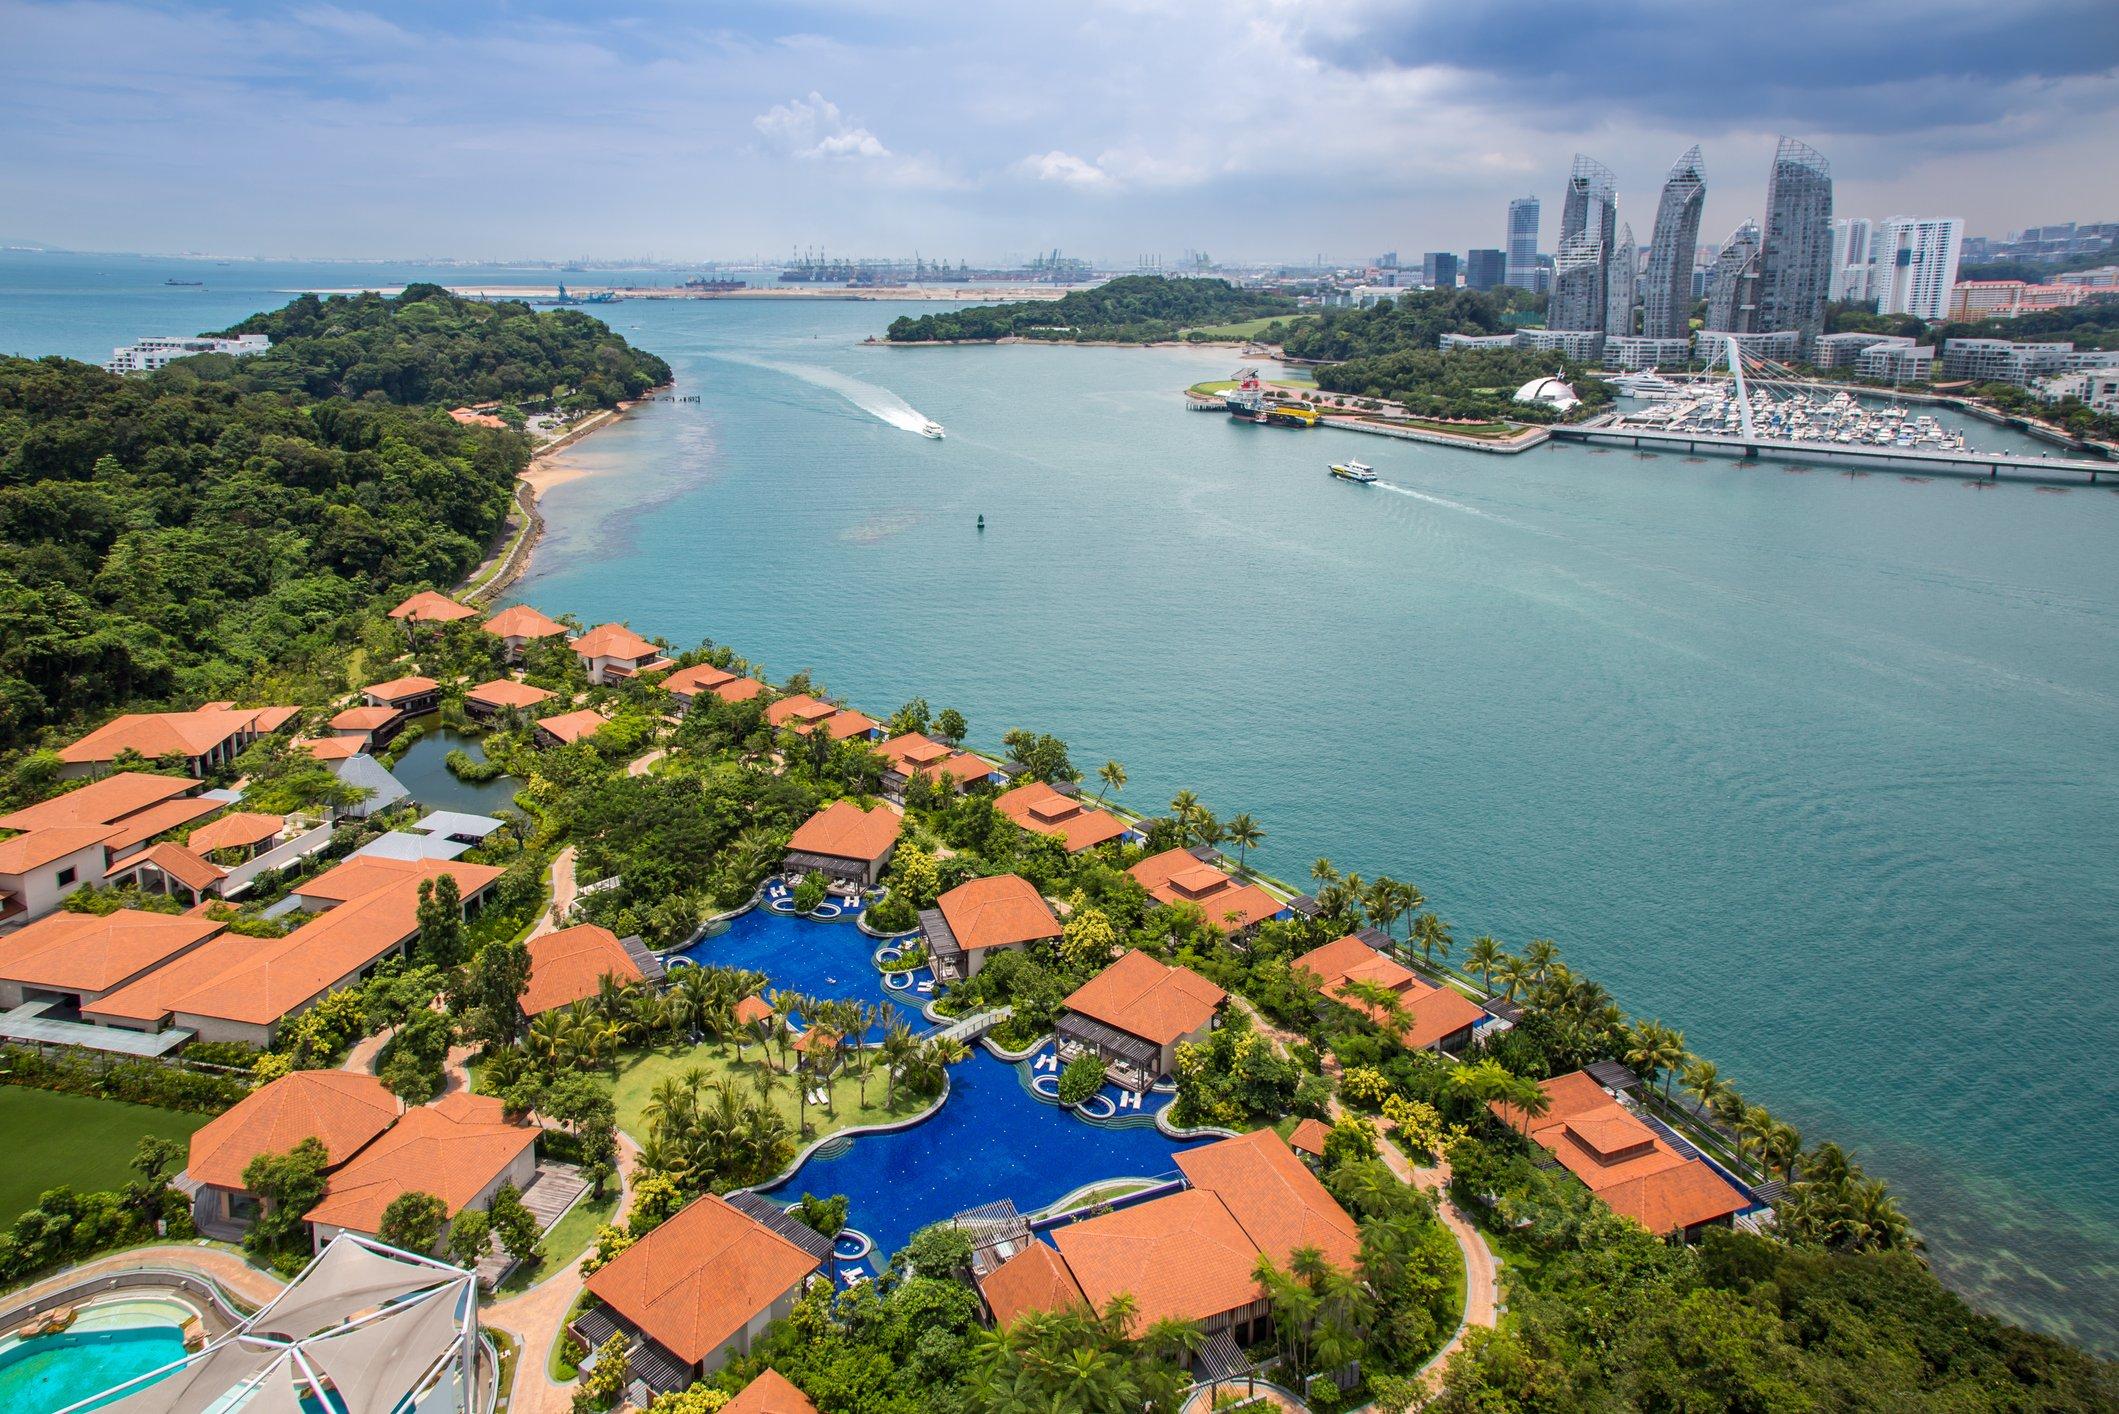 Aerial view of Sentosa island, Singapore